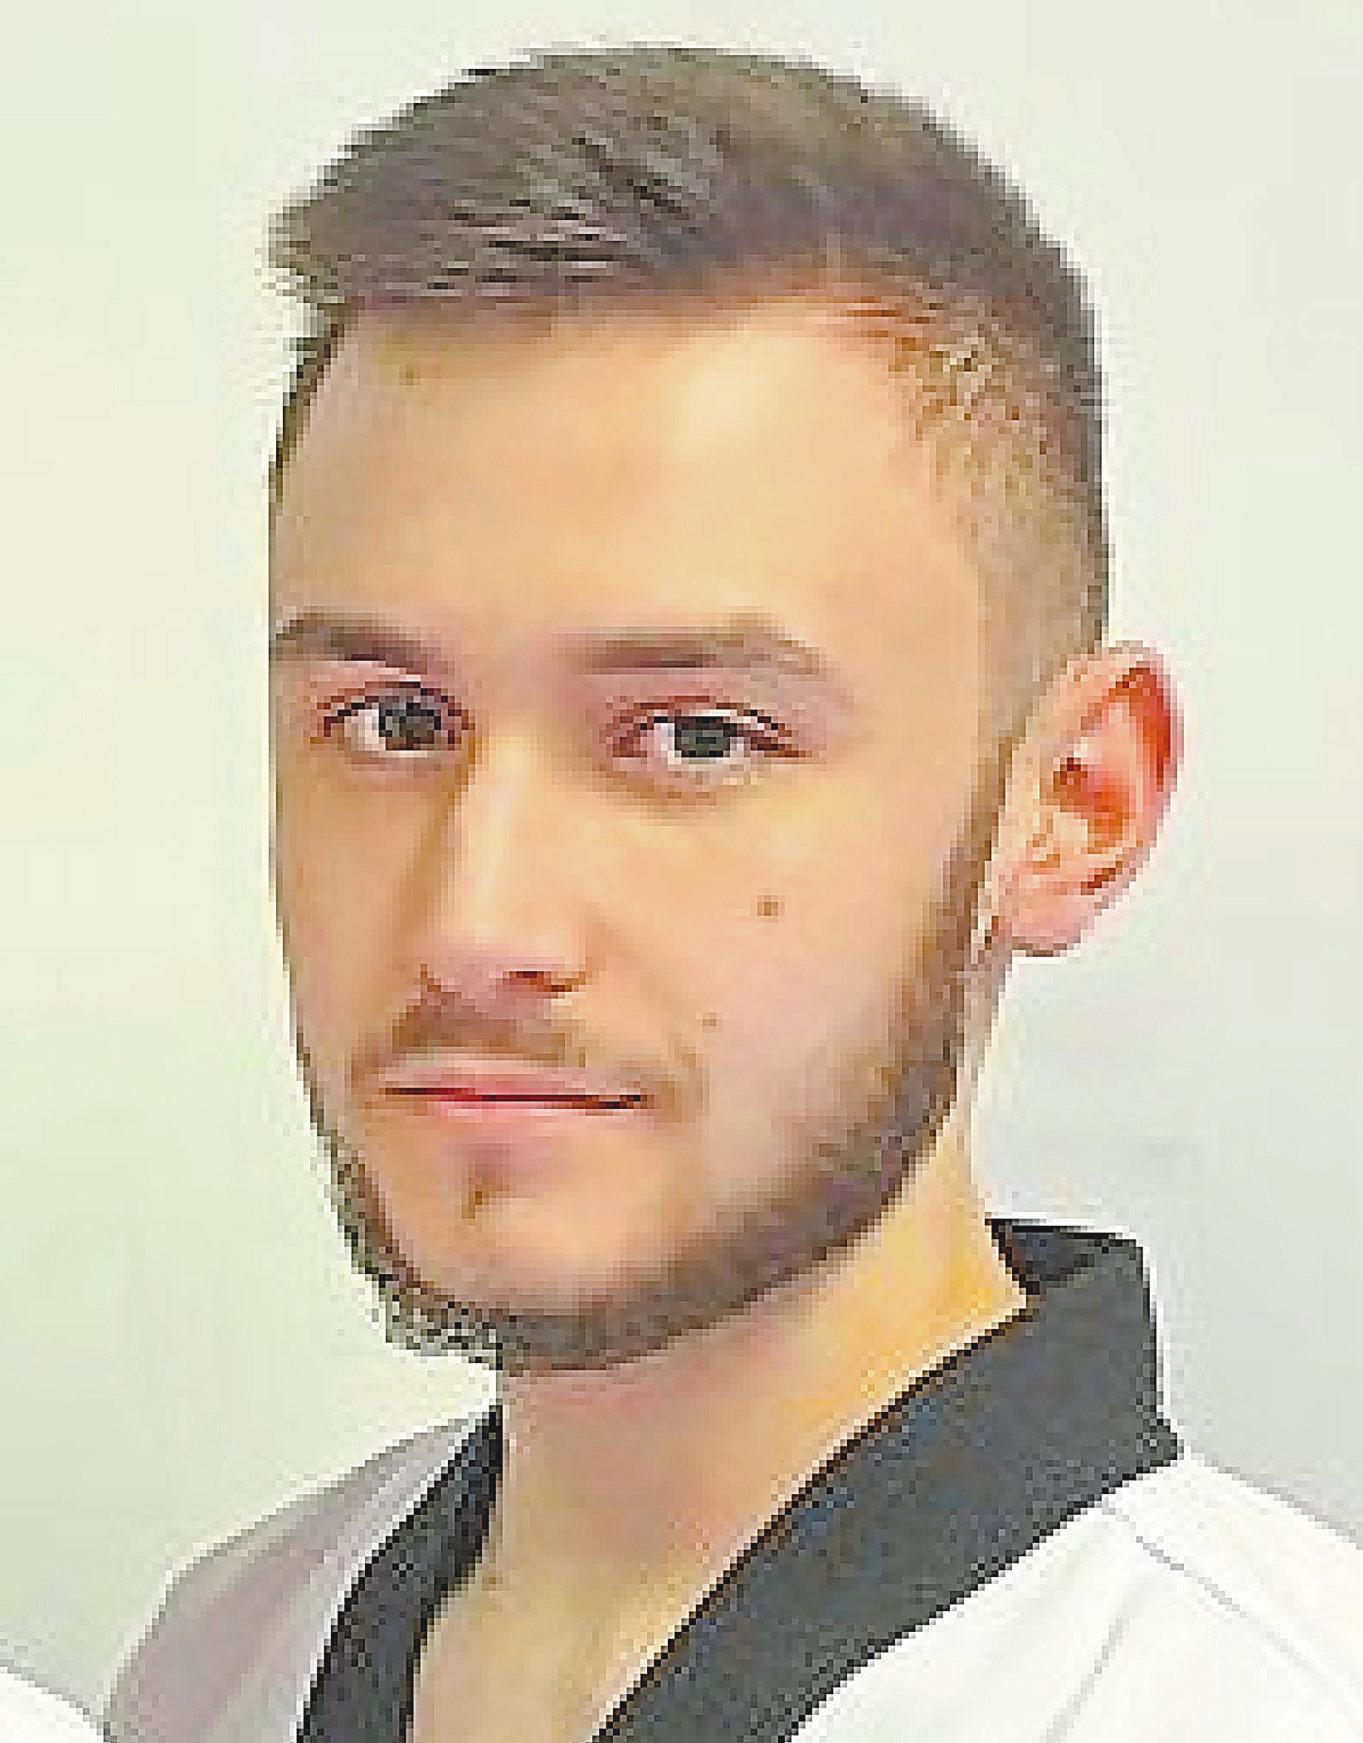 Ilkan Kaan Alarslan, Taekwondo: 2. Platz Landesmeisterschaften, 1. Platz bei den Internationalen Masters, Mitglied im Landeskader